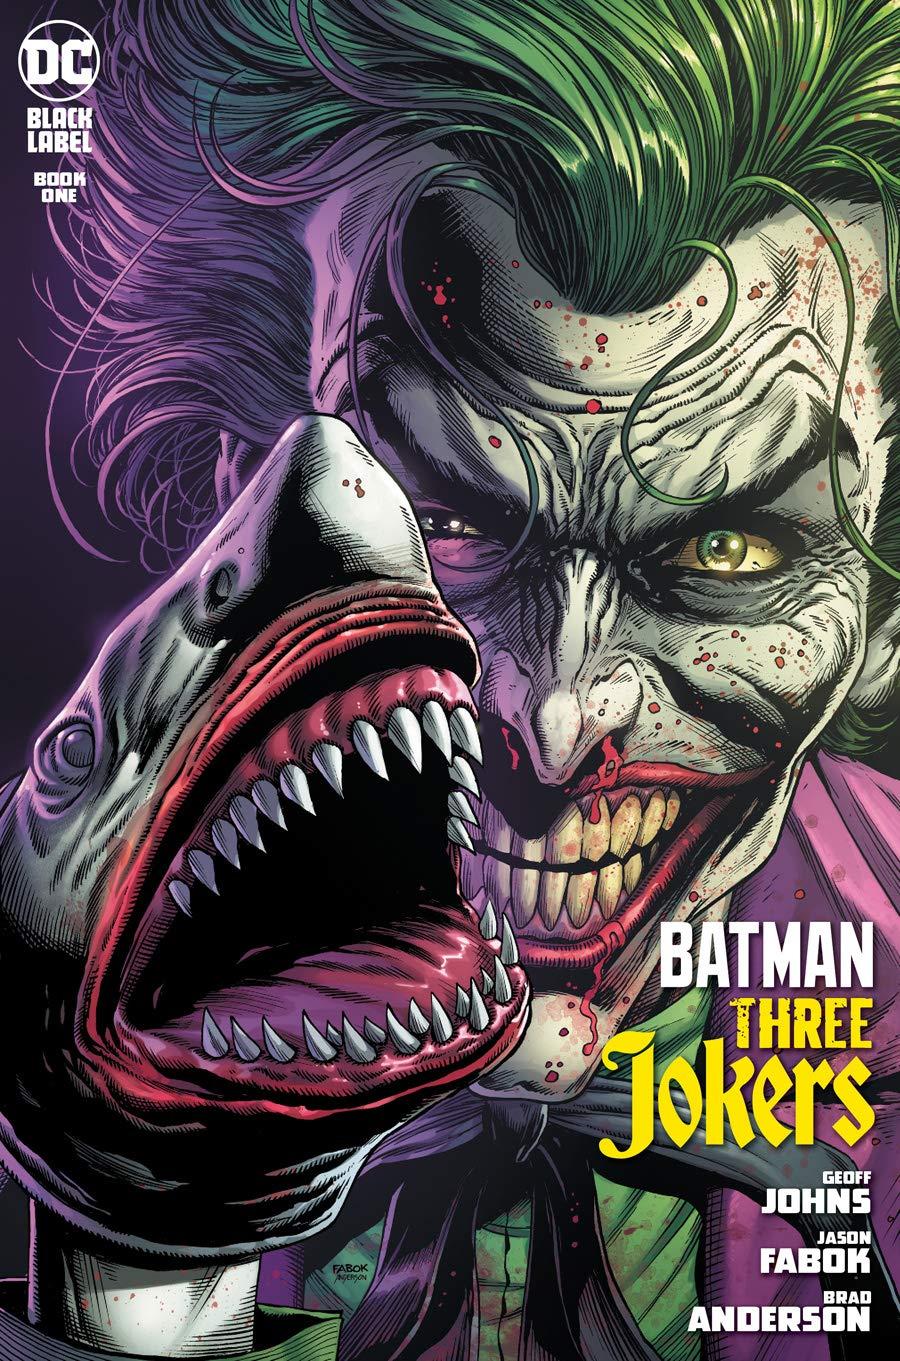 FISH VARIANT THREE JOKERS #1 ~ Geoff Johns /& Jason Fabok ~ DC Comics BATMAN